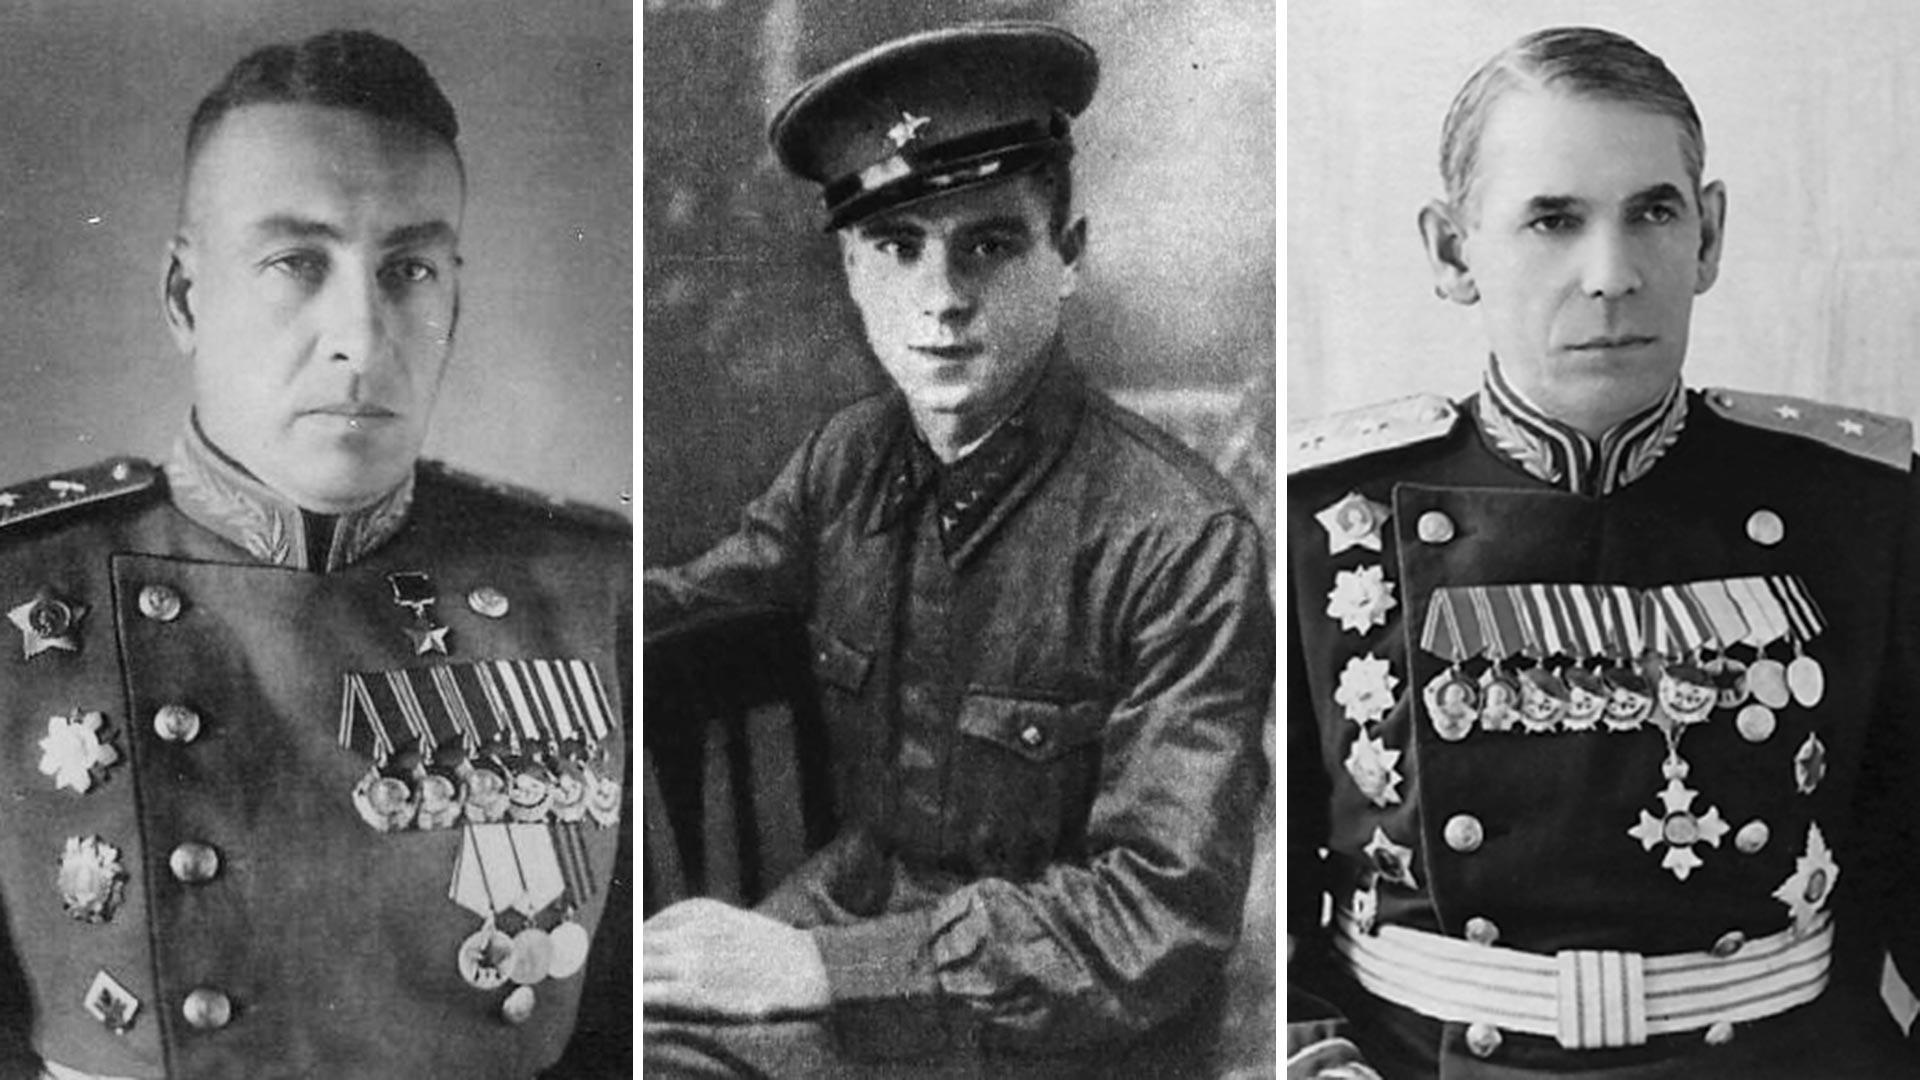 Сергей Сергеевич Волкенштейн; Мейер Вячеслав Эдуардович; Николай Александрович Гаген.